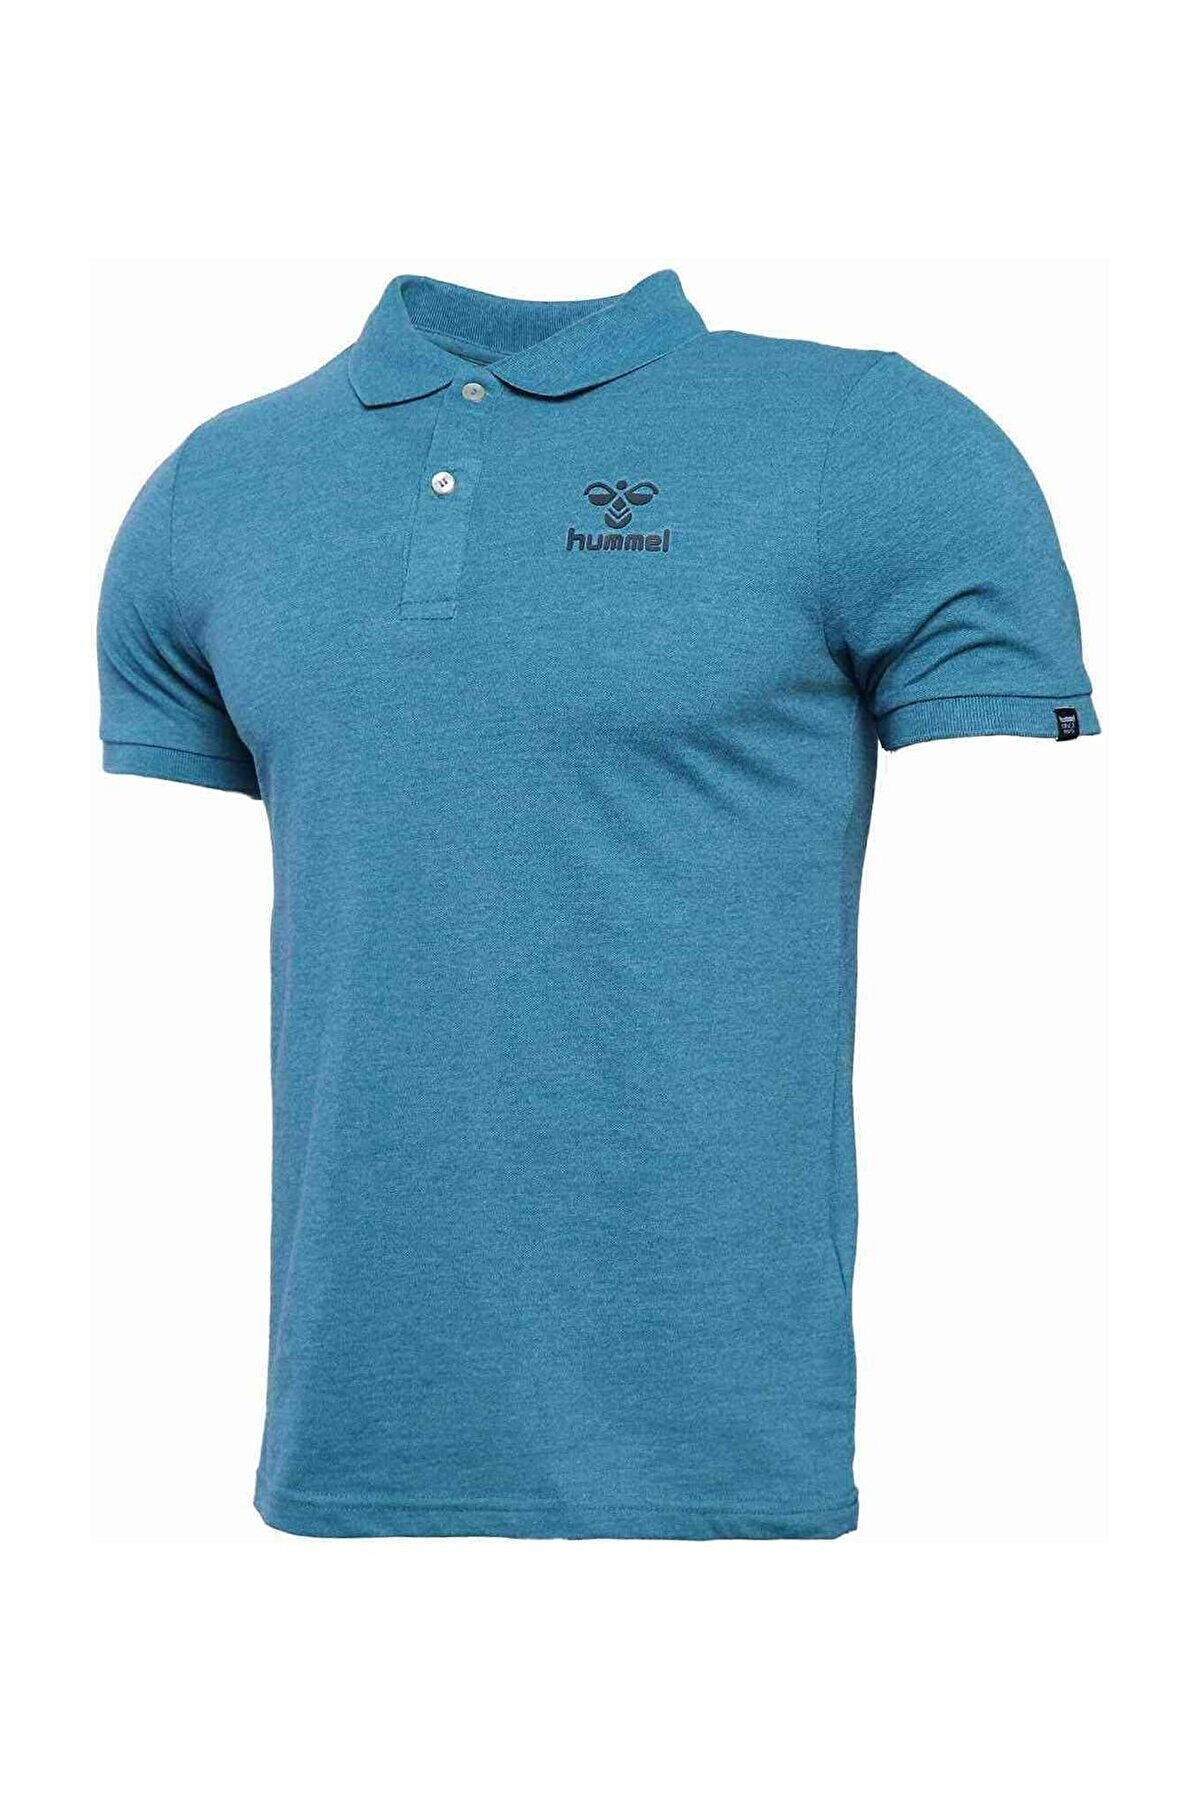 HUMMEL Erkek T-Shirt Hmlfanen Polo S/S